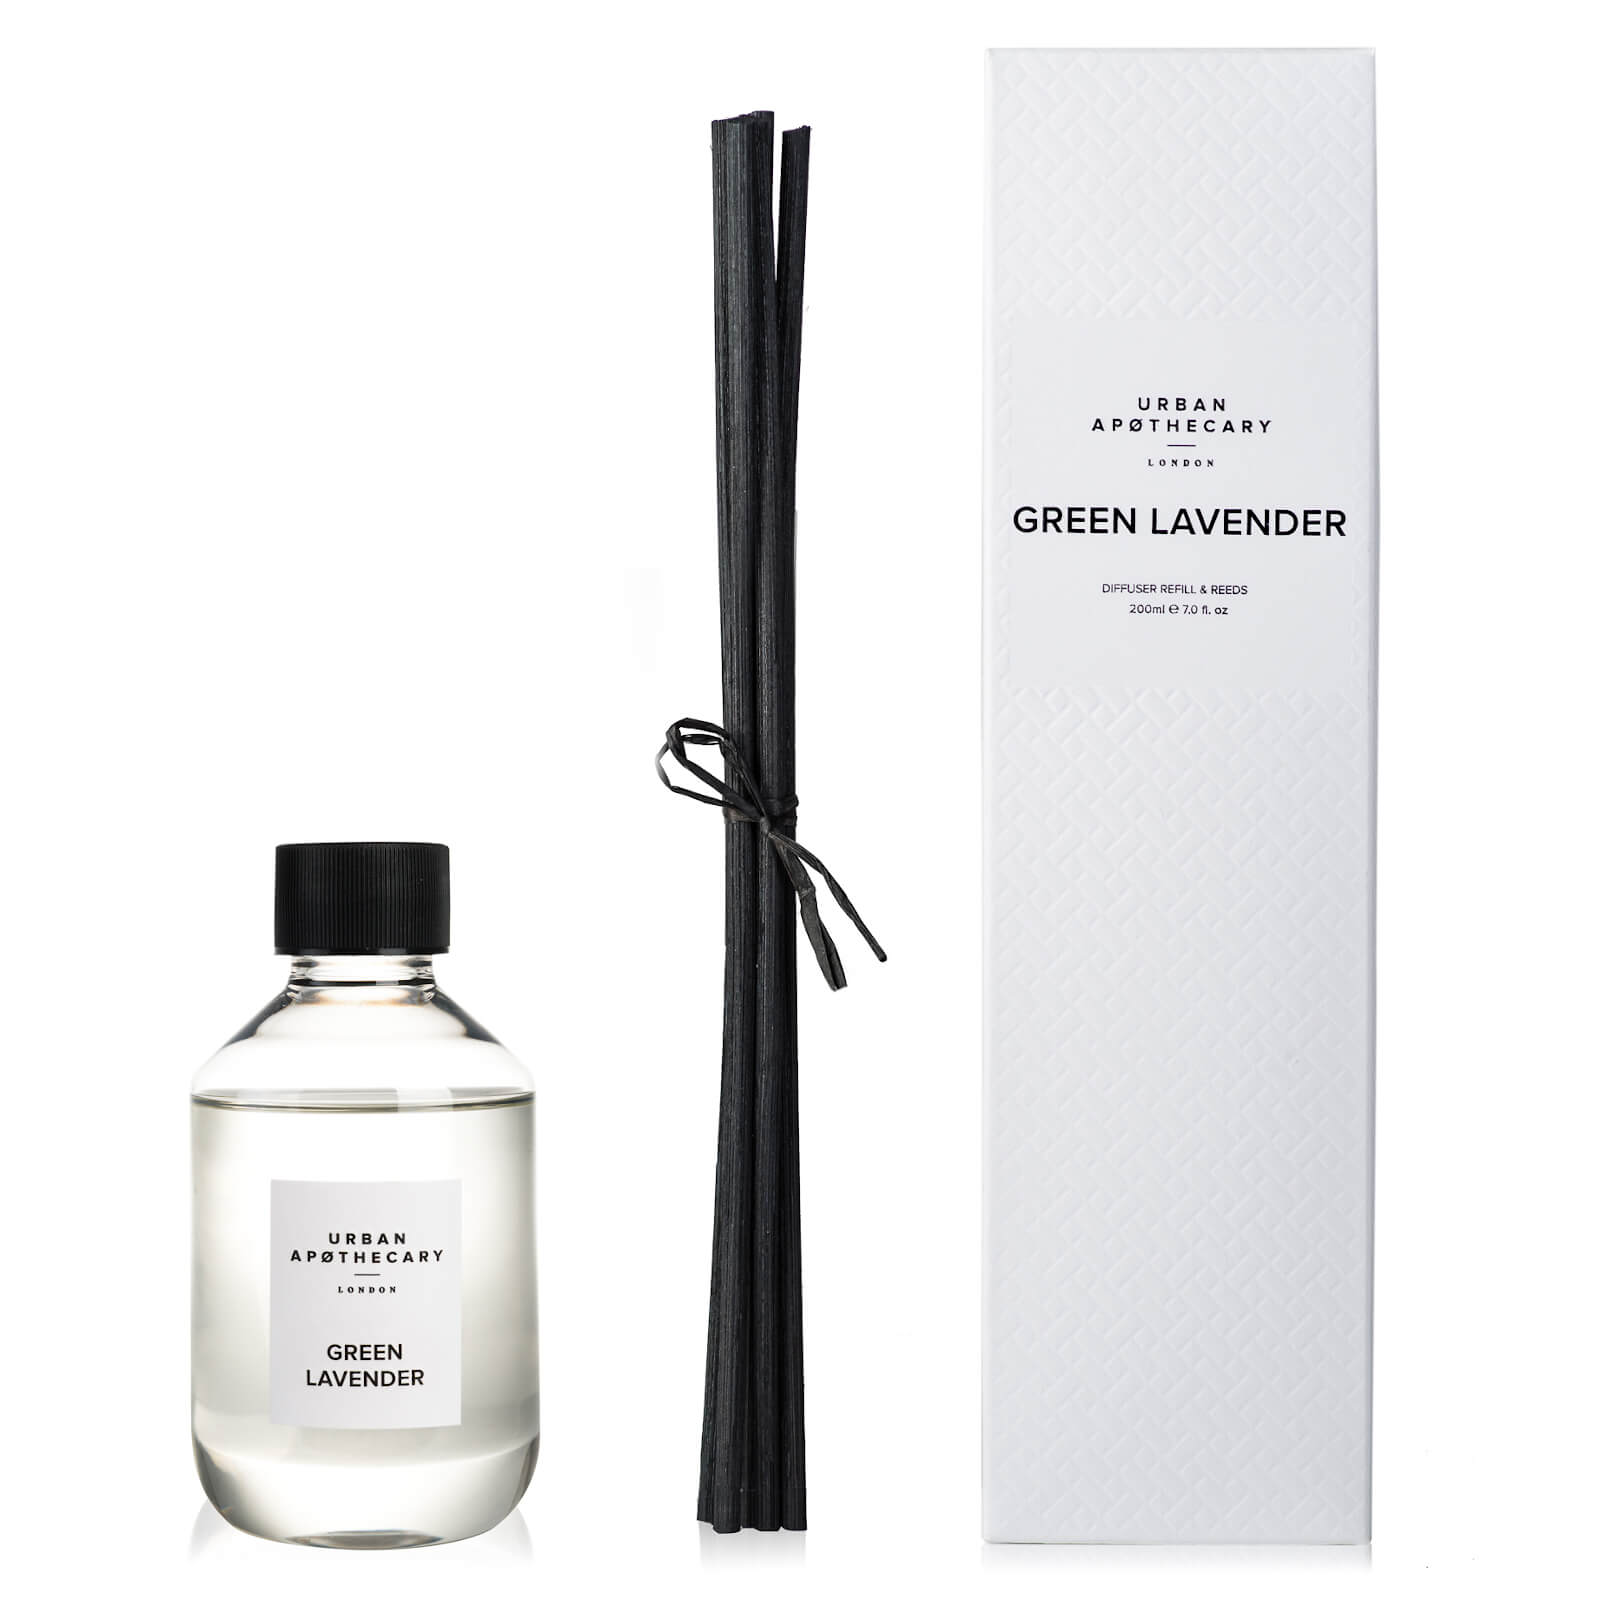 Urban Apothecary Green Lavender Luxury Diffuser Refill - 200ml